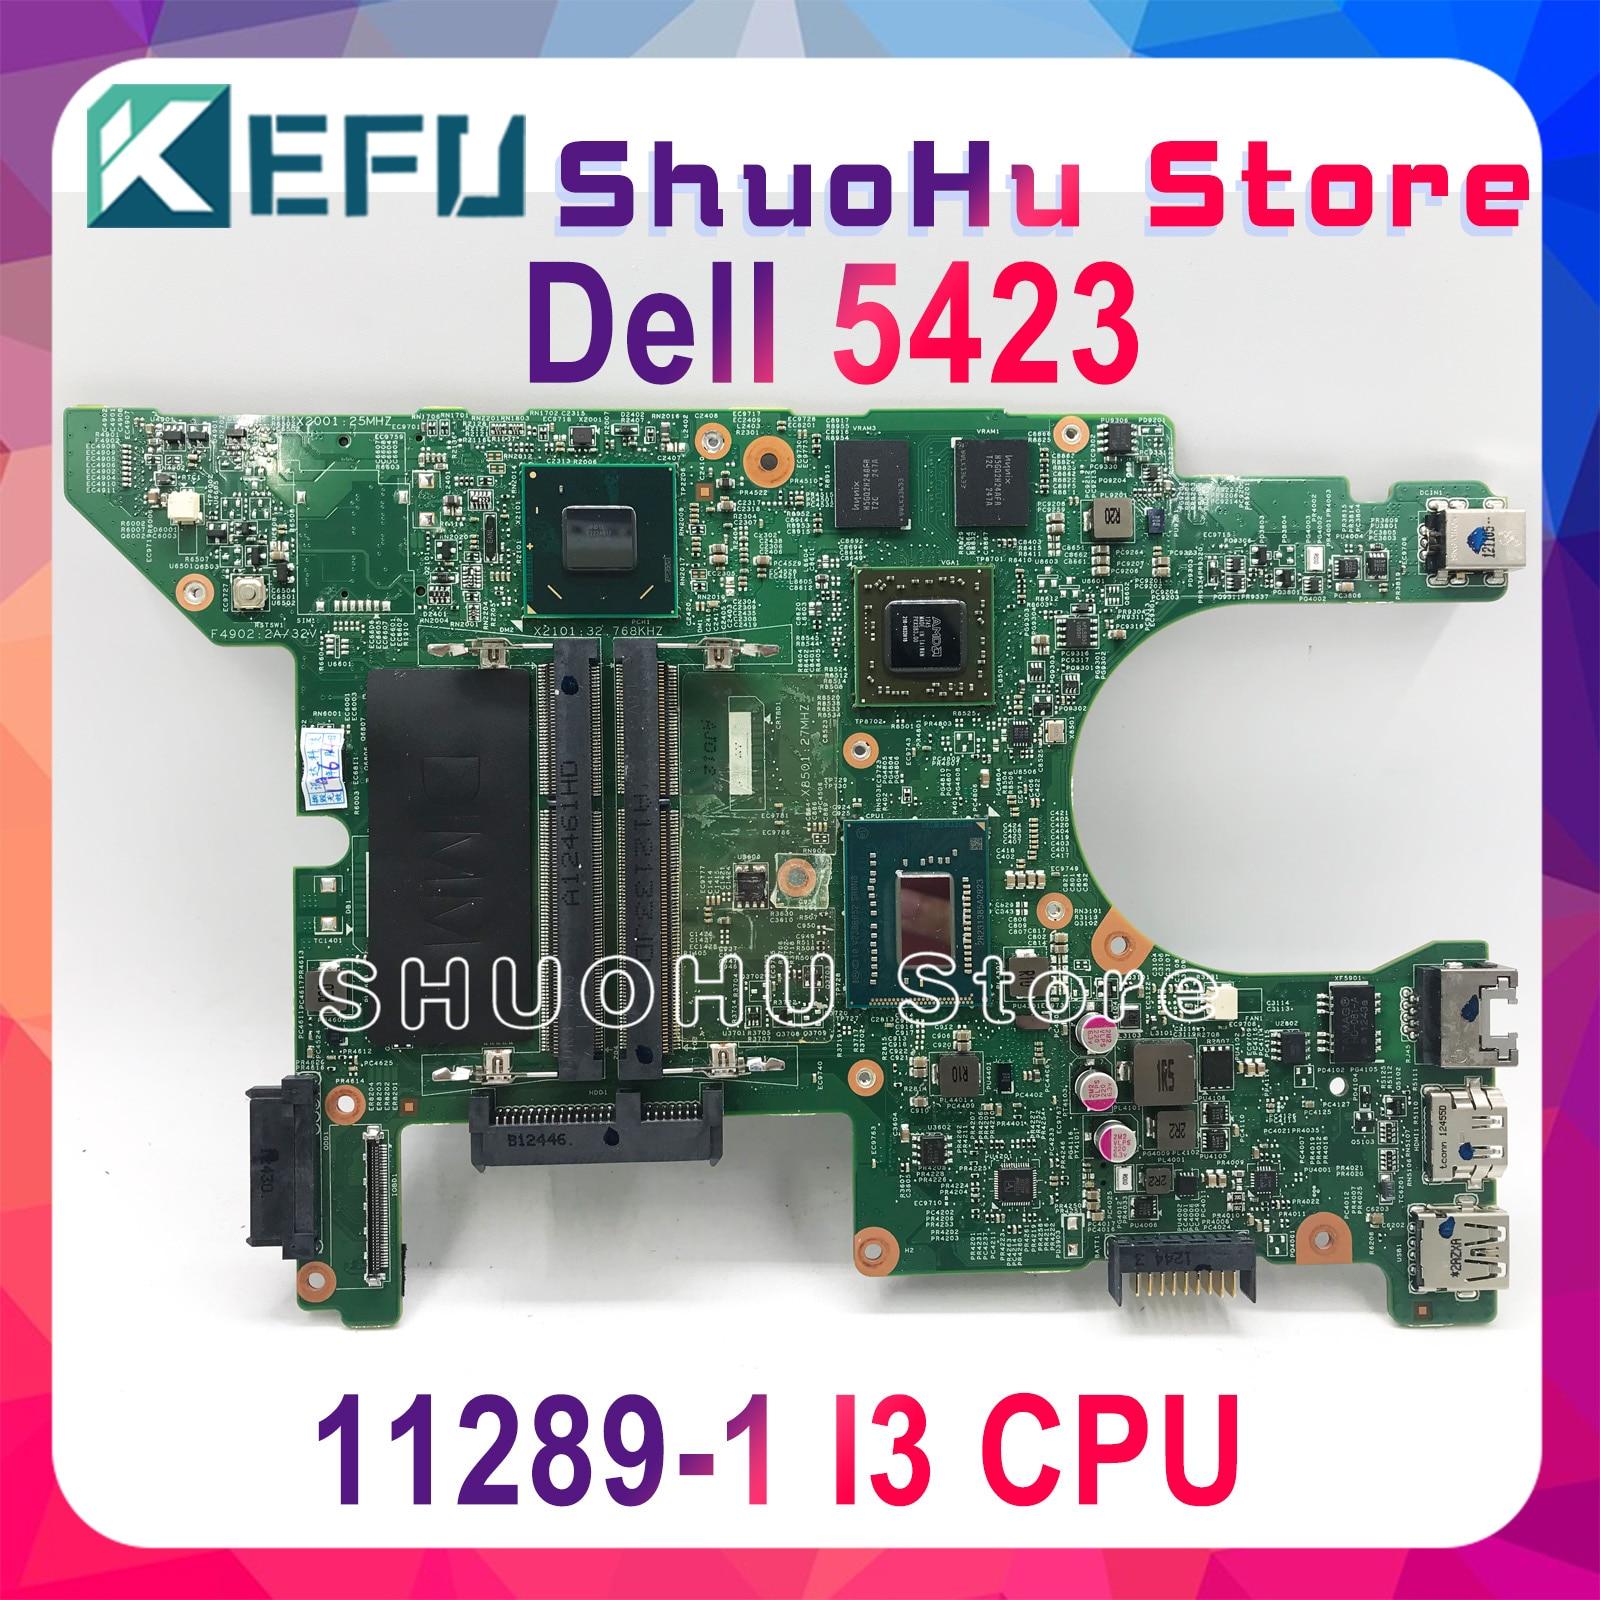 KEFU 11289-1 placa madre para dell 5423 placa base dell Inspiron 14Z-5423 motherbard I3 cpu prueba original notebook